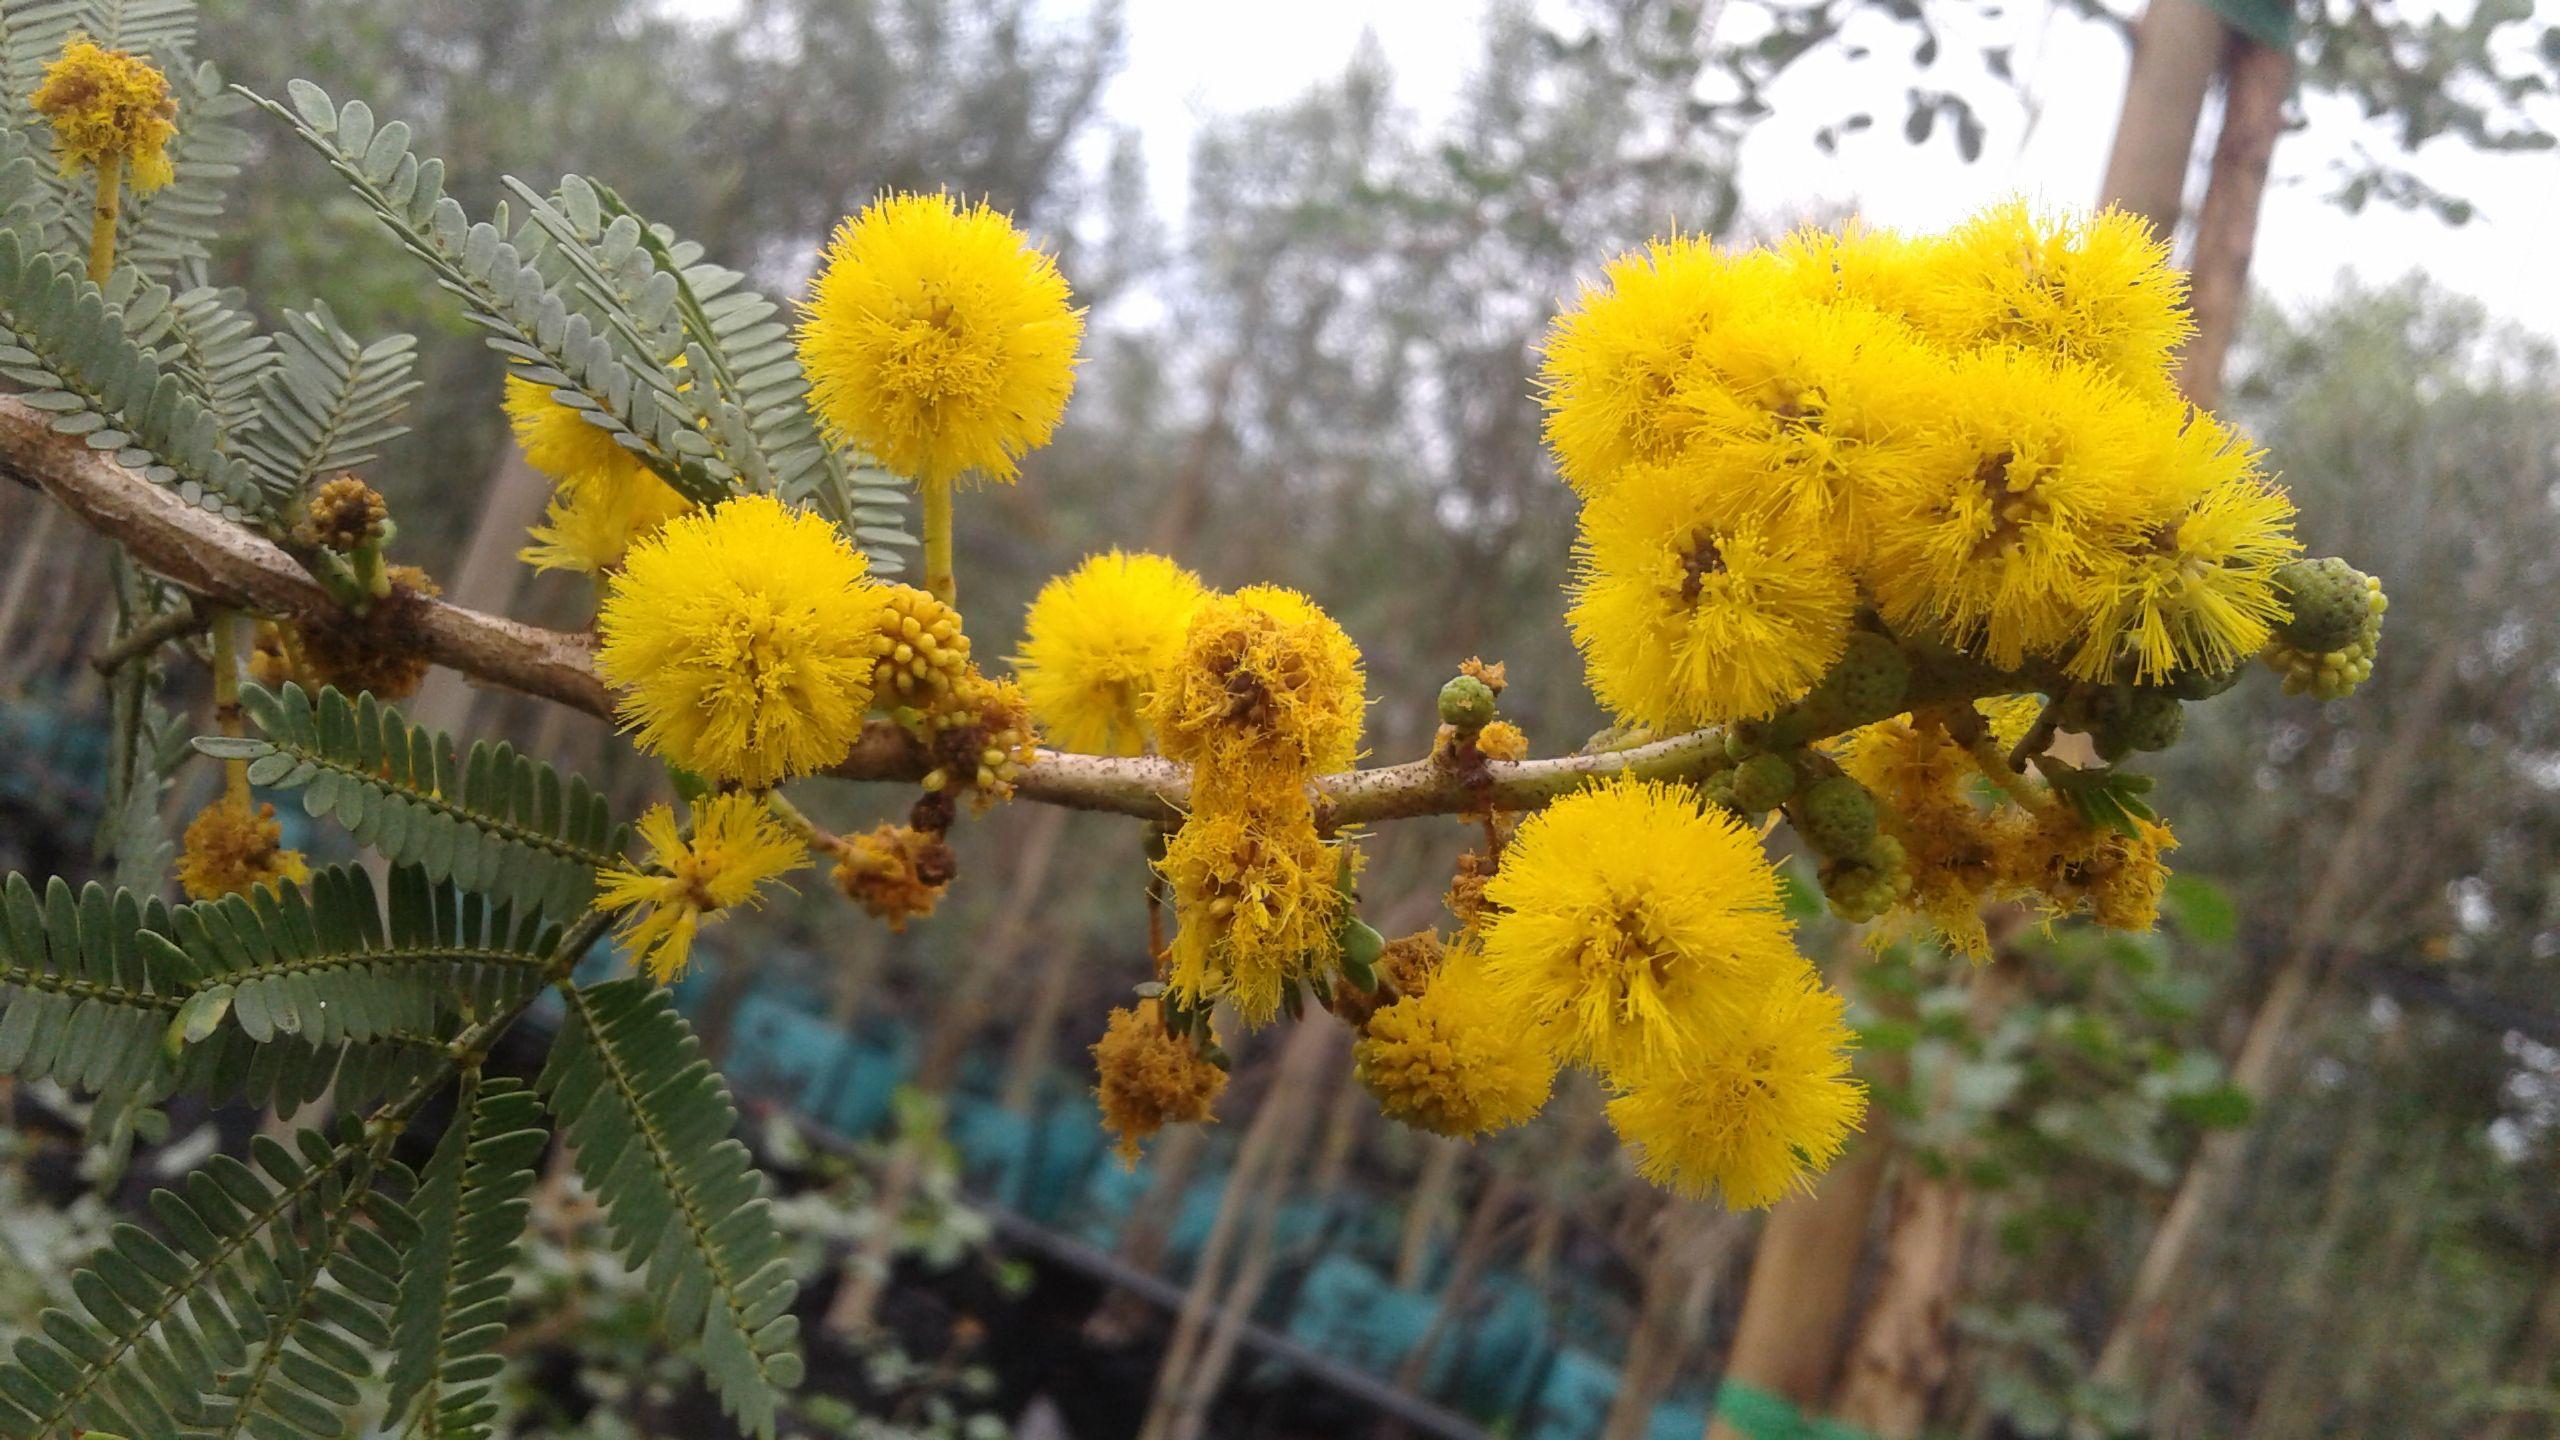 Acacia Karroo Presently Known As Vachellia Karroo Sweet Thorn Cape Karoo Mimosa Flowers Photography Trees To Plant Yellow Flowers